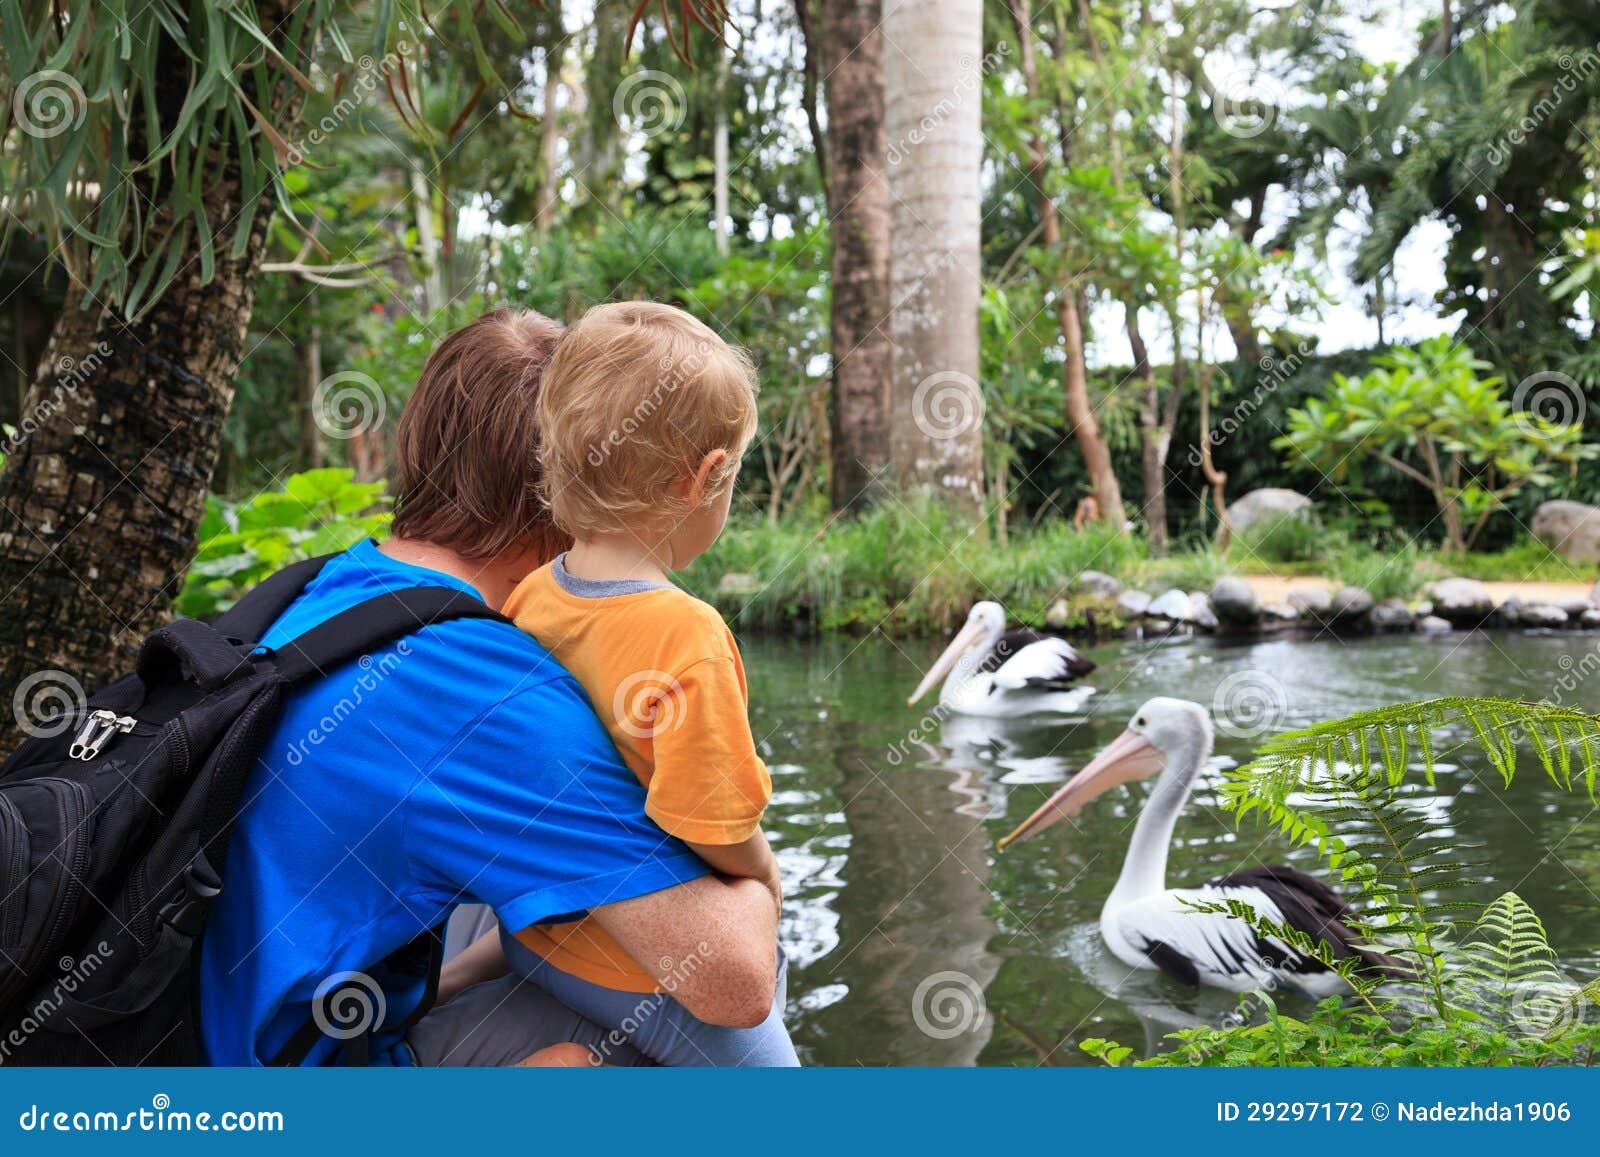 Familie, die Pelikane betrachtet